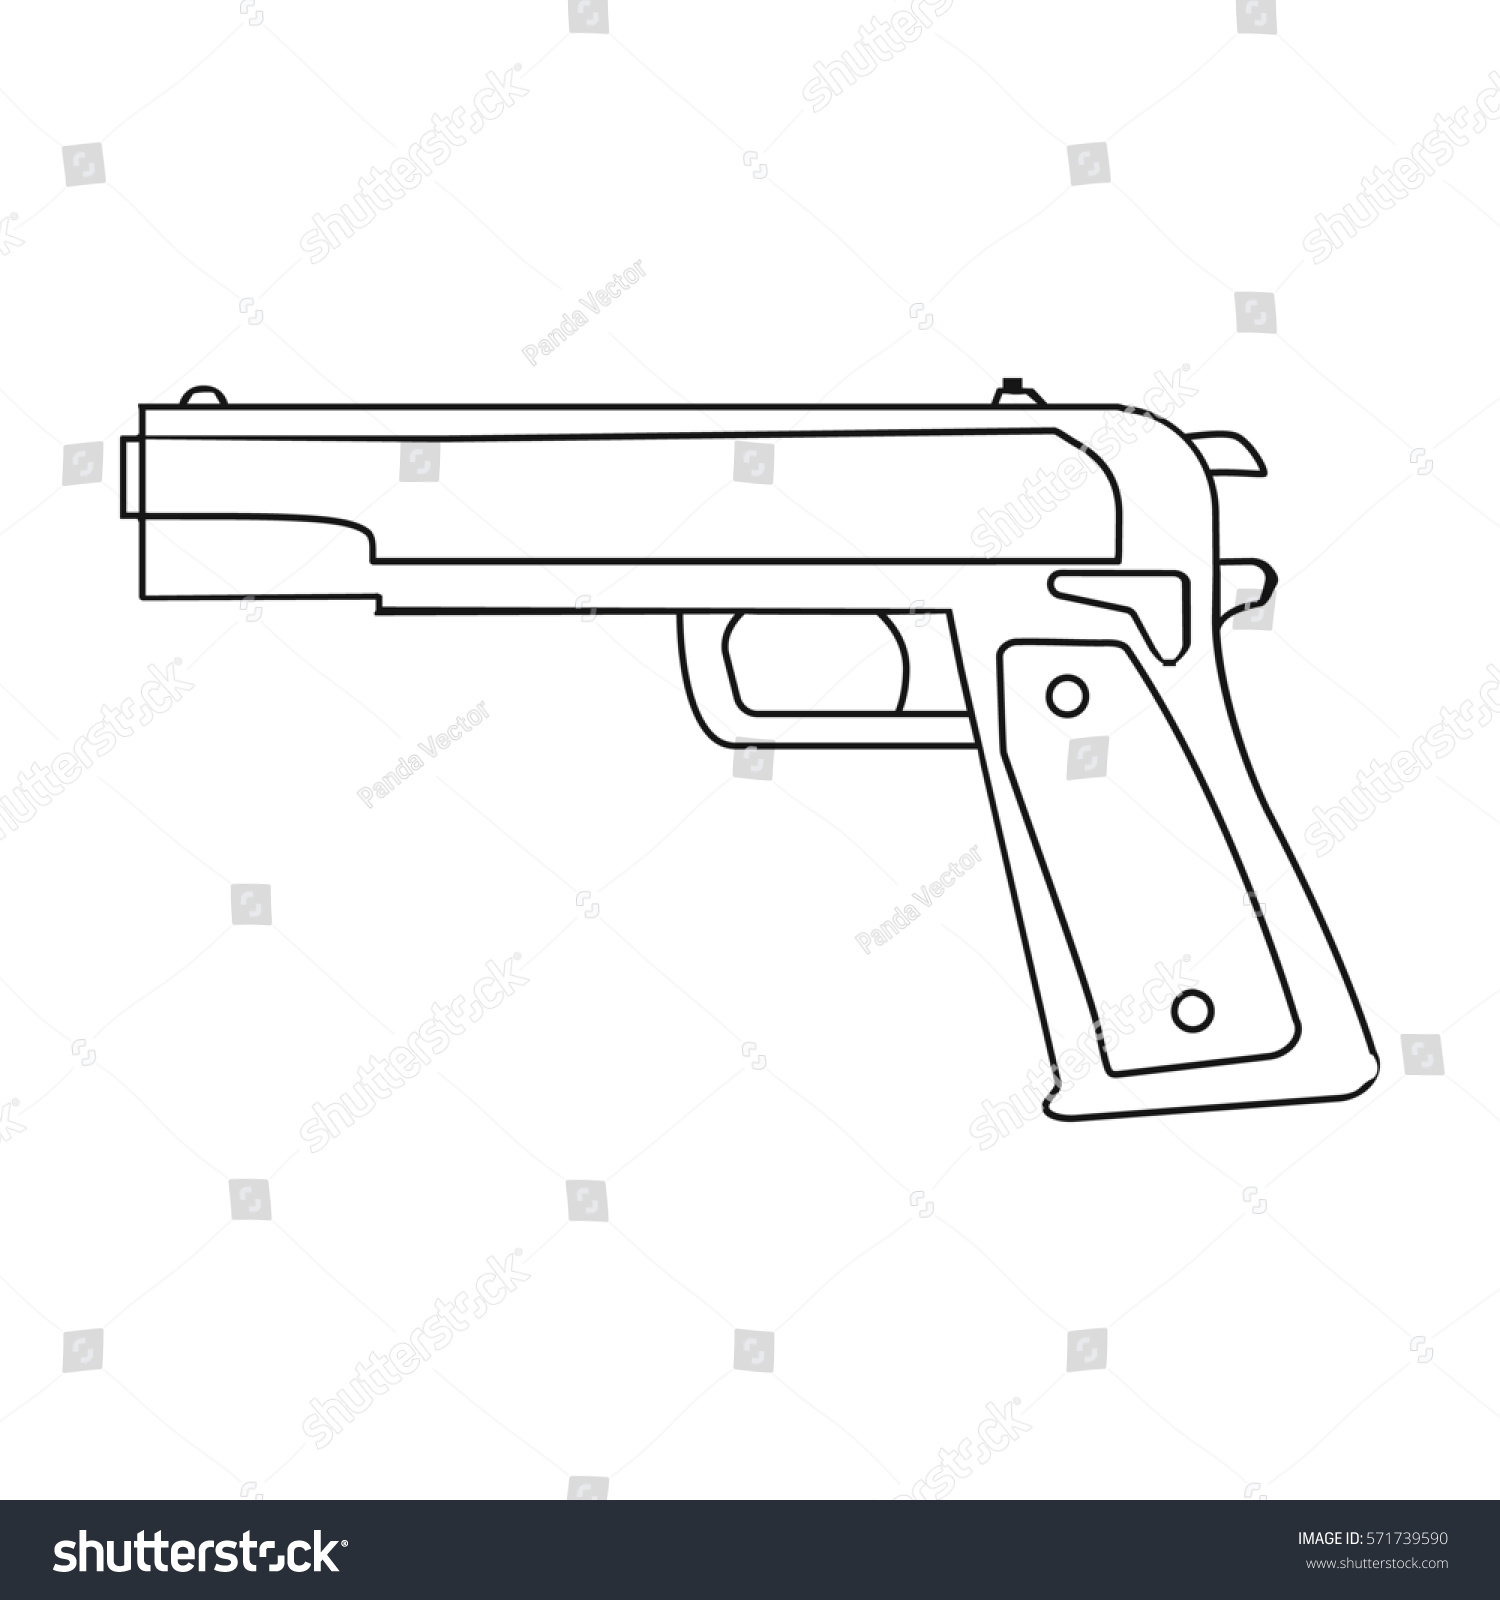 Military handgun icon outline style isolated stock illustration military handgun icon in outline style isolated on white background military and army symbol stock buycottarizona